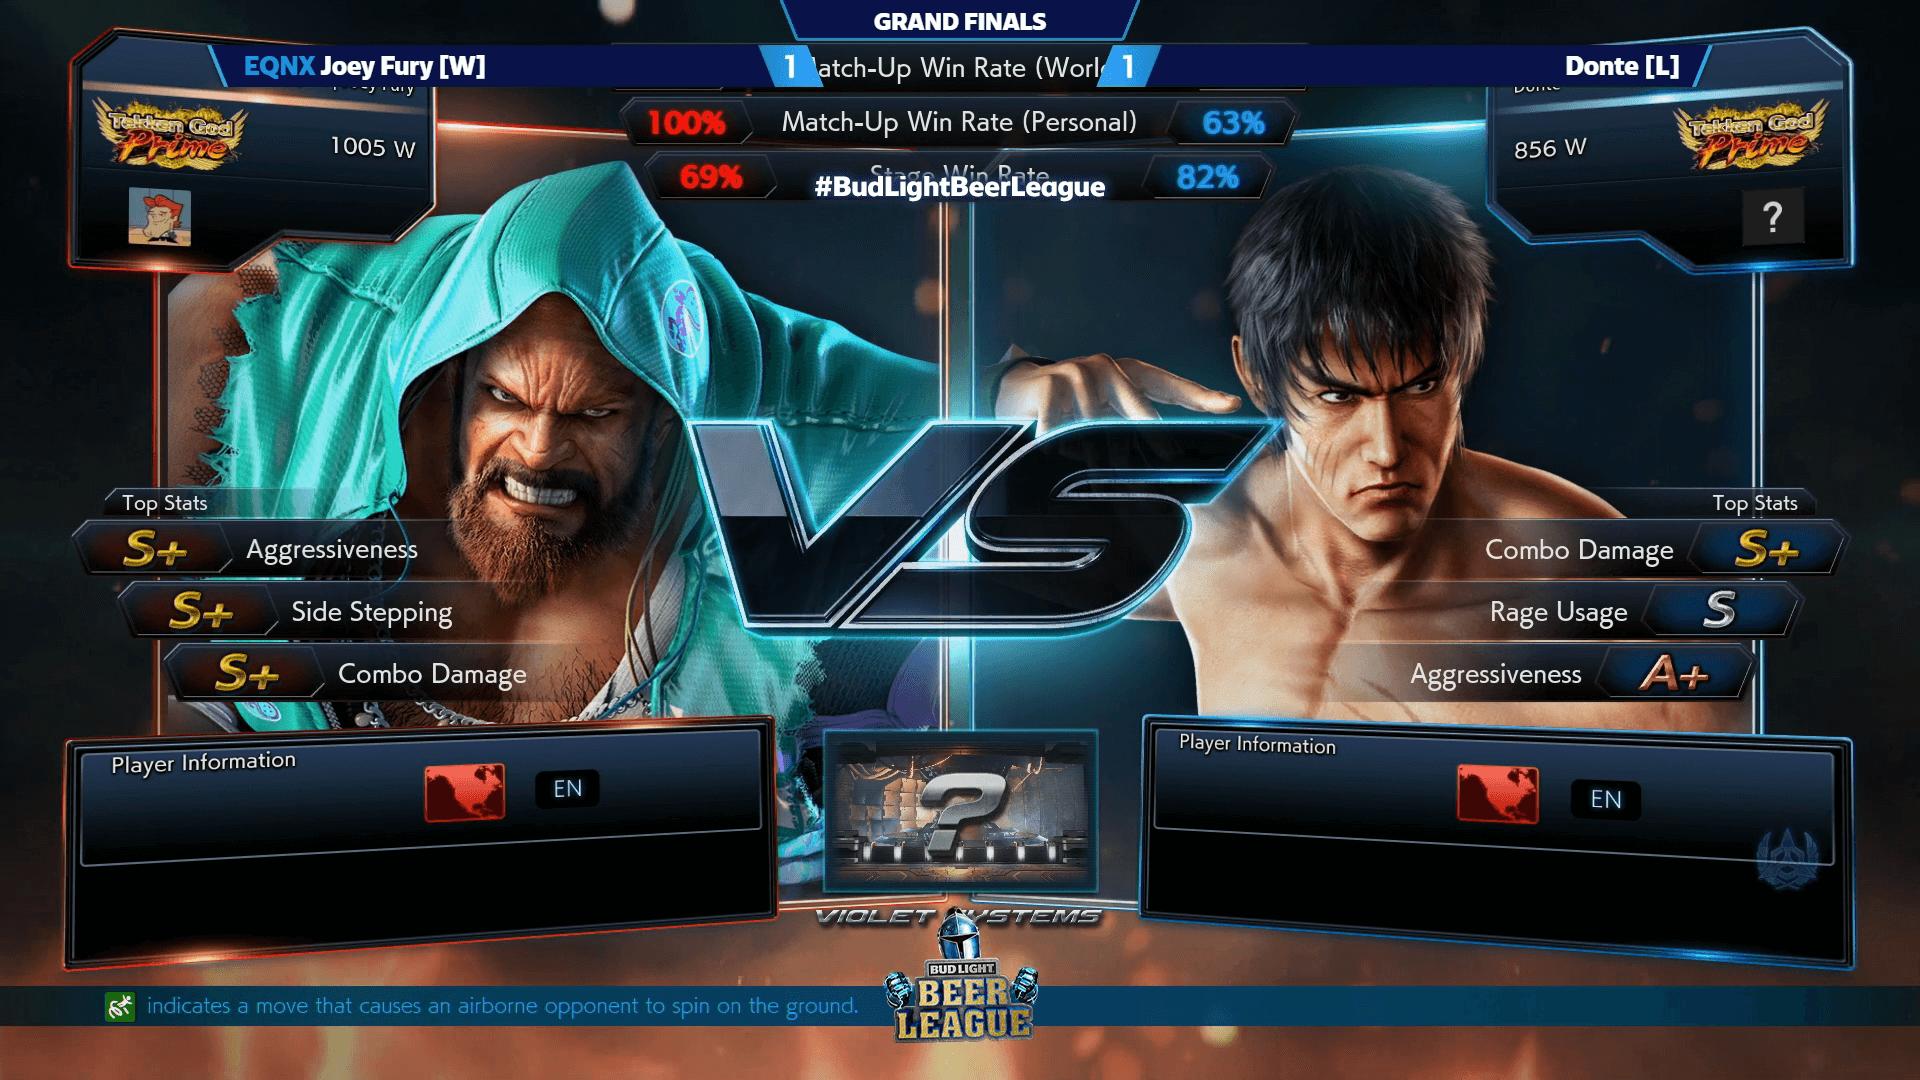 Joey Fury Wins Bud Light Beer League Tekken 7 East 3